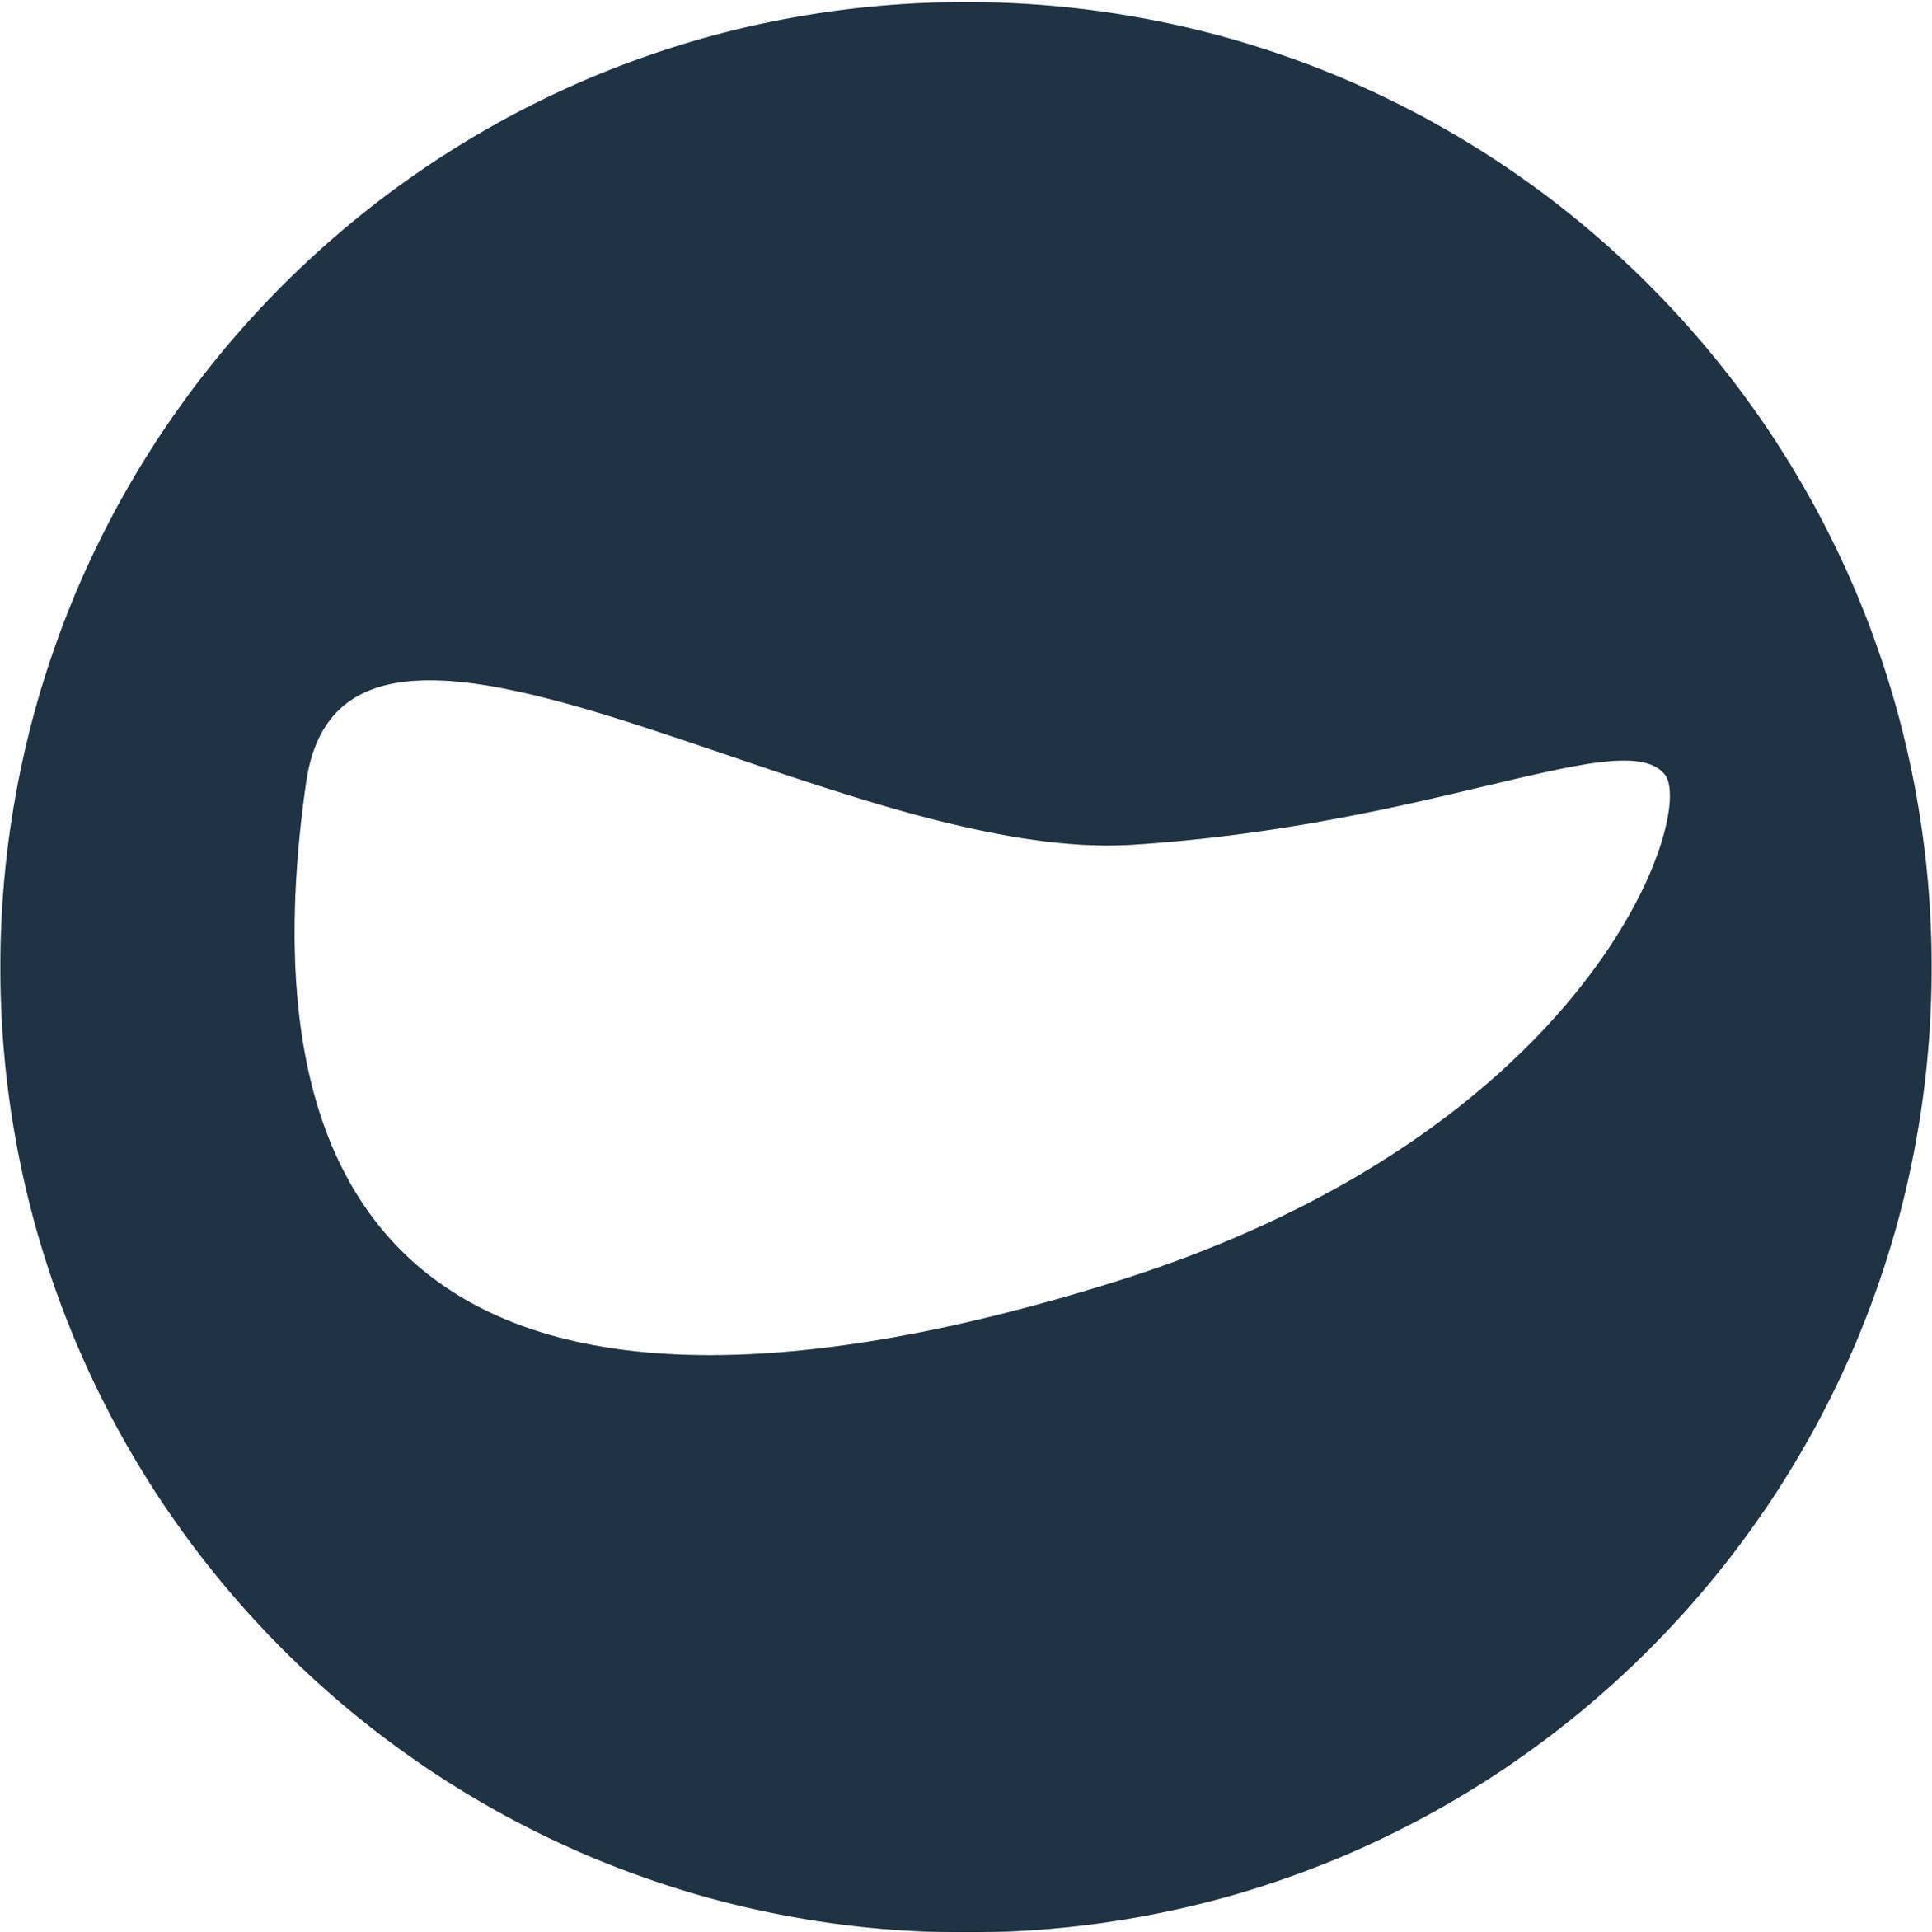 face-mask-grey-circle.jpg